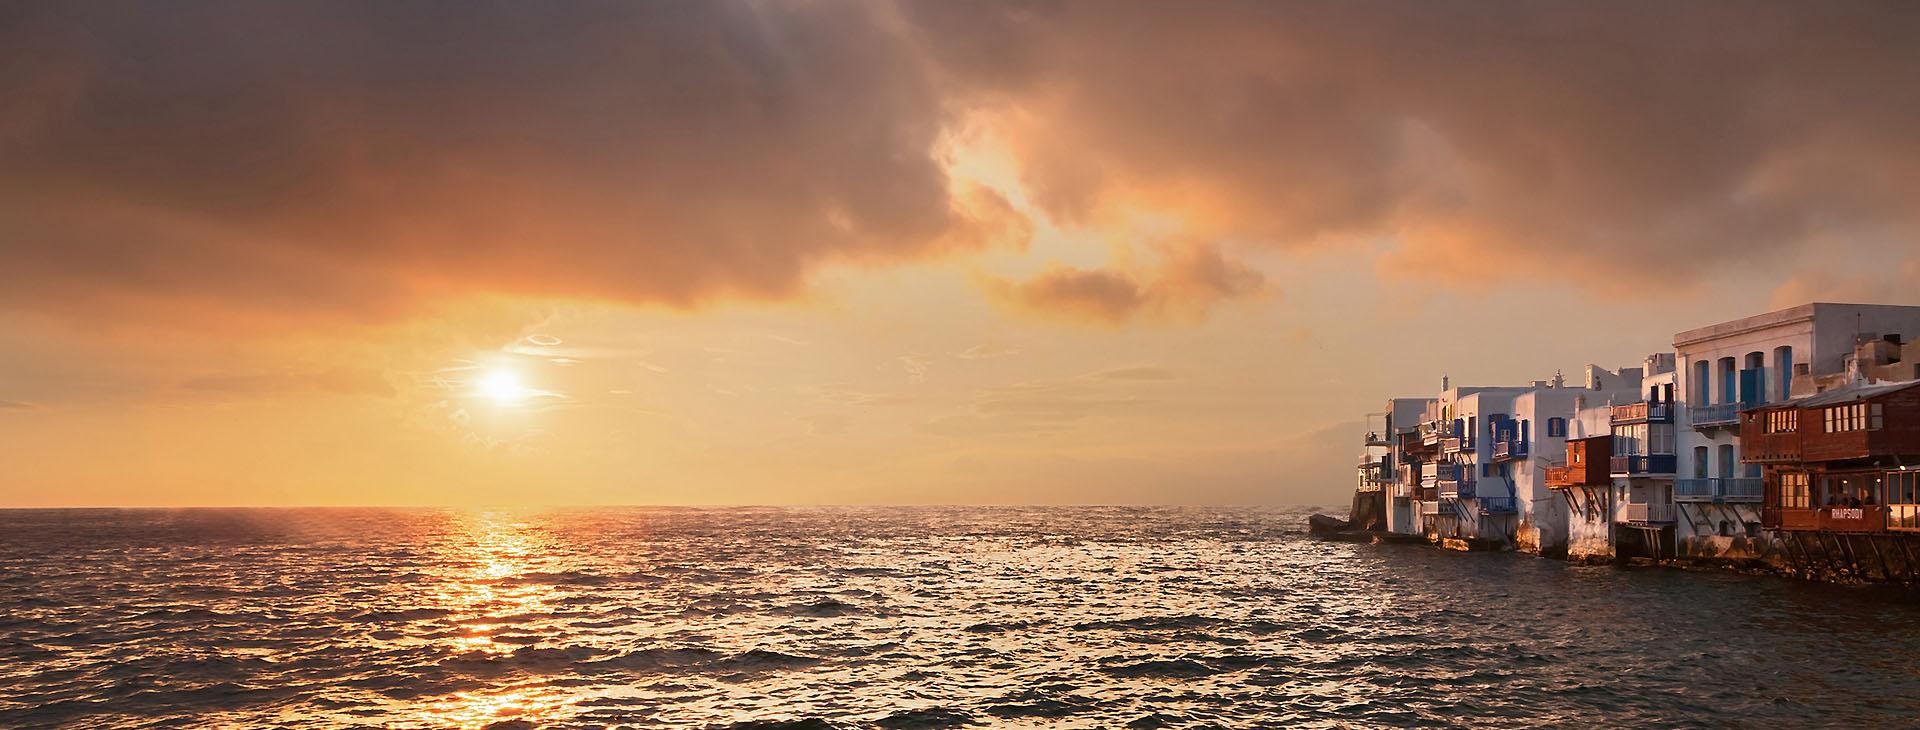 Sunset at Mykonos island